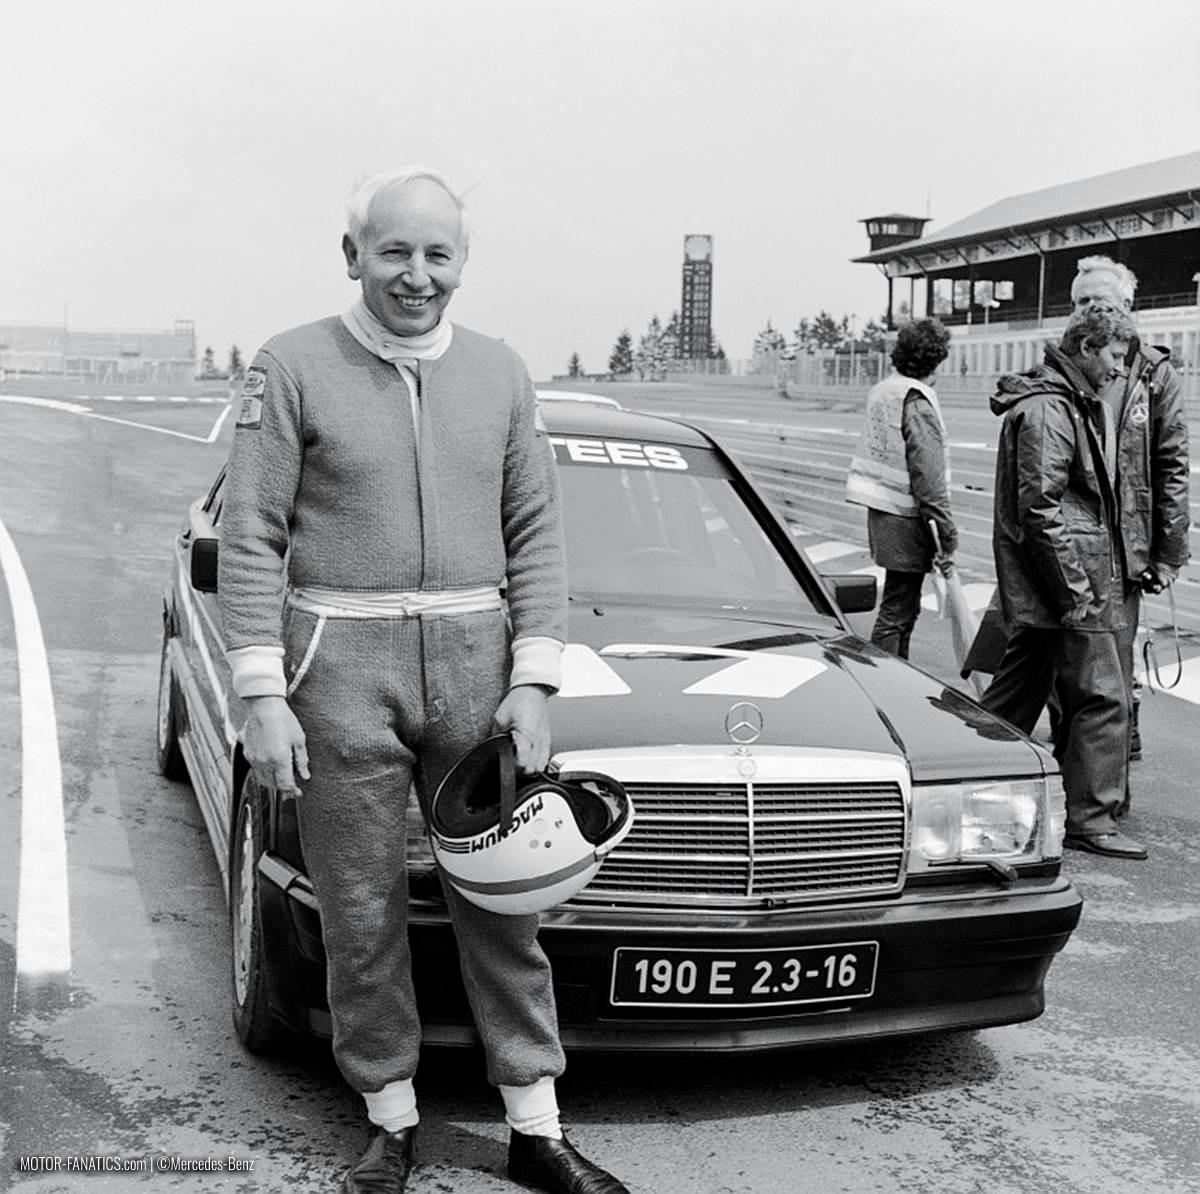 1984 Nurburgring Race Mercedes Benz 190e 2.3 16v John Surtees